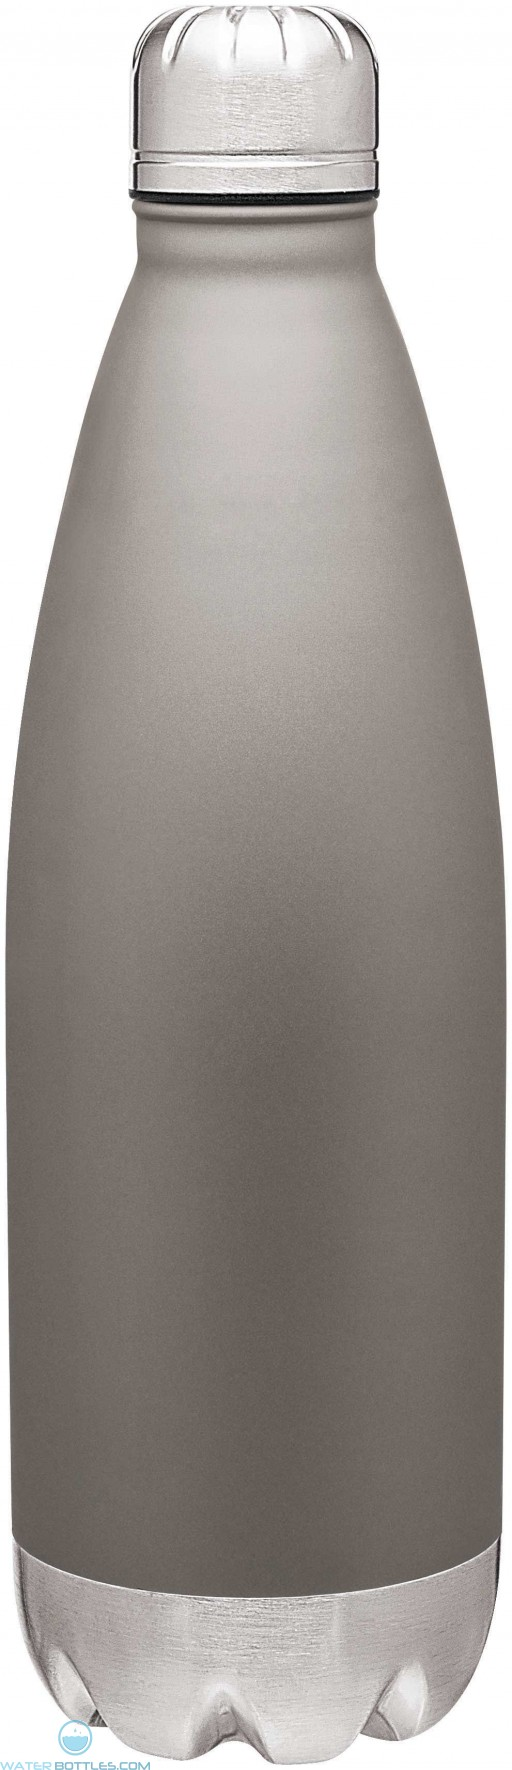 H2Go Force Thermal Bottles | 34 oz - Matte Gray